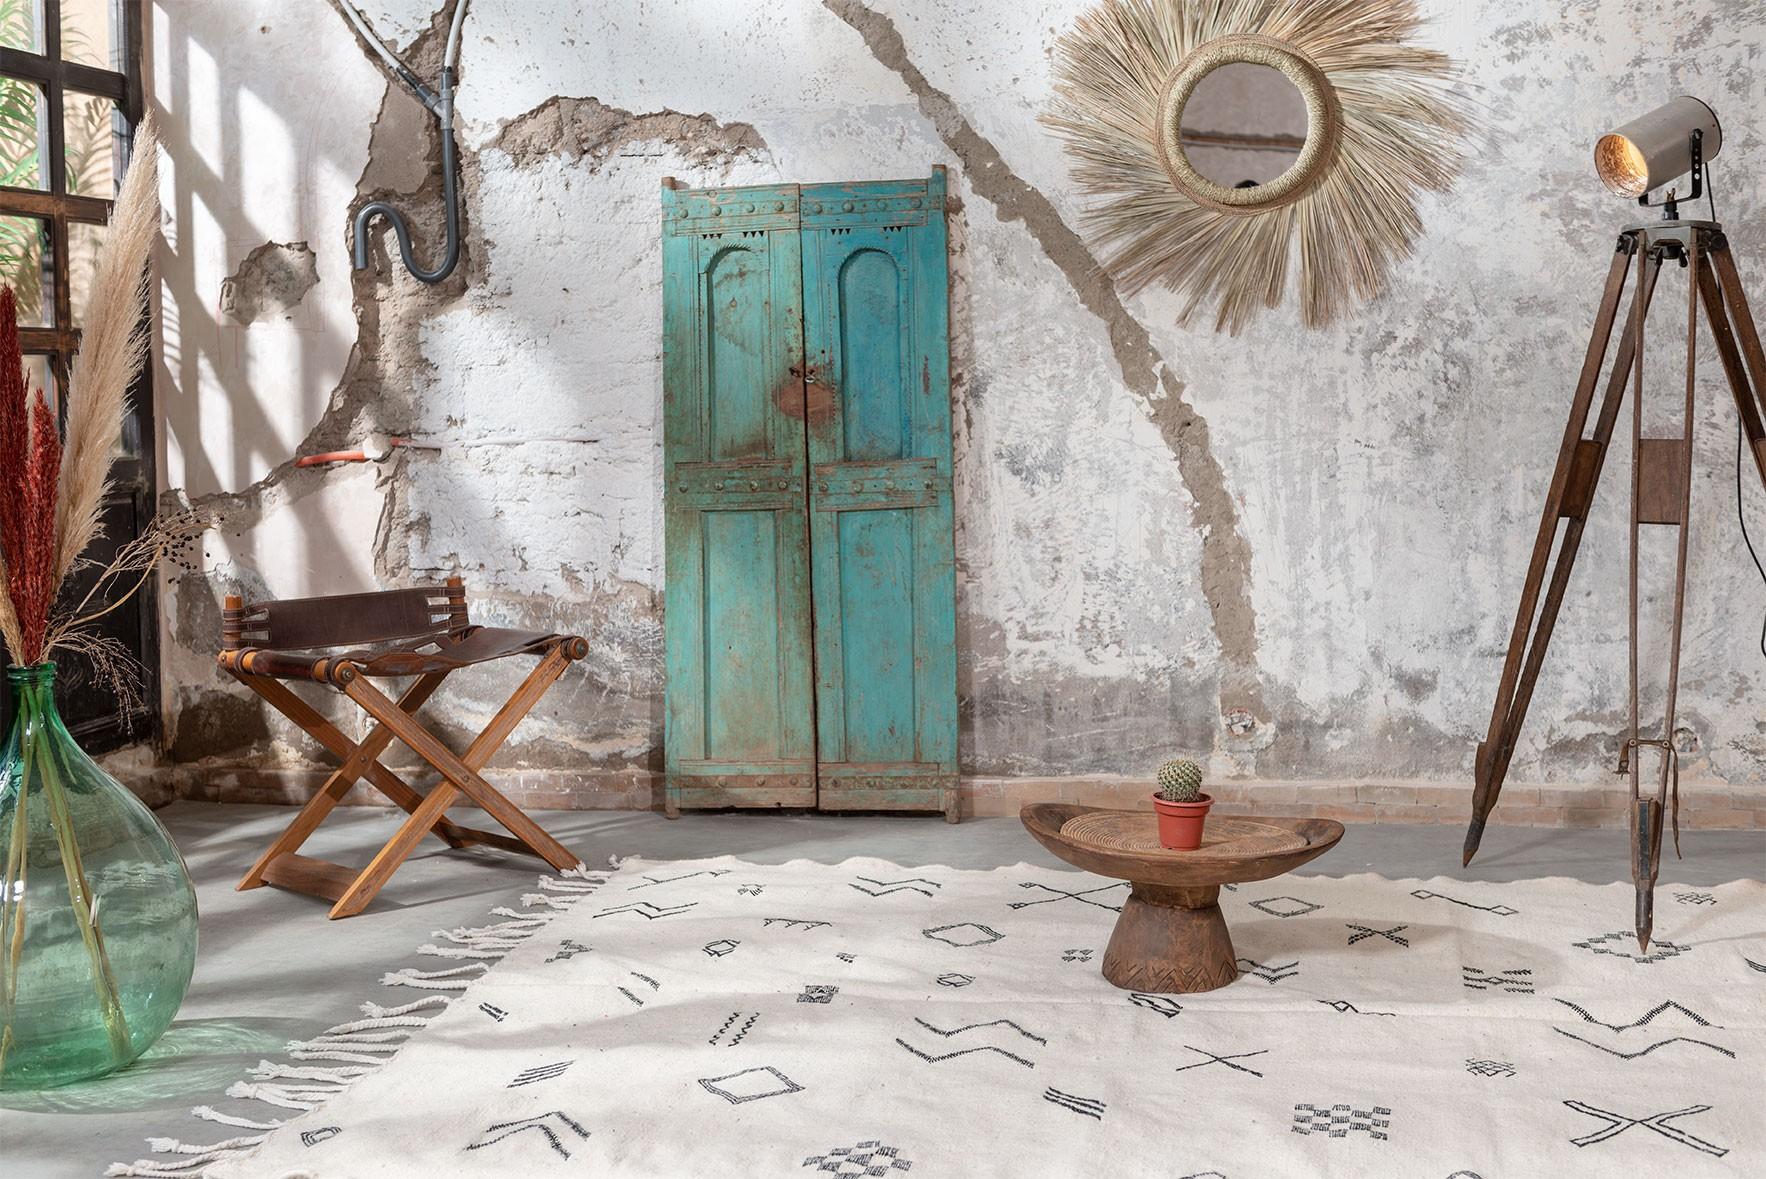 White and gray kilim rug